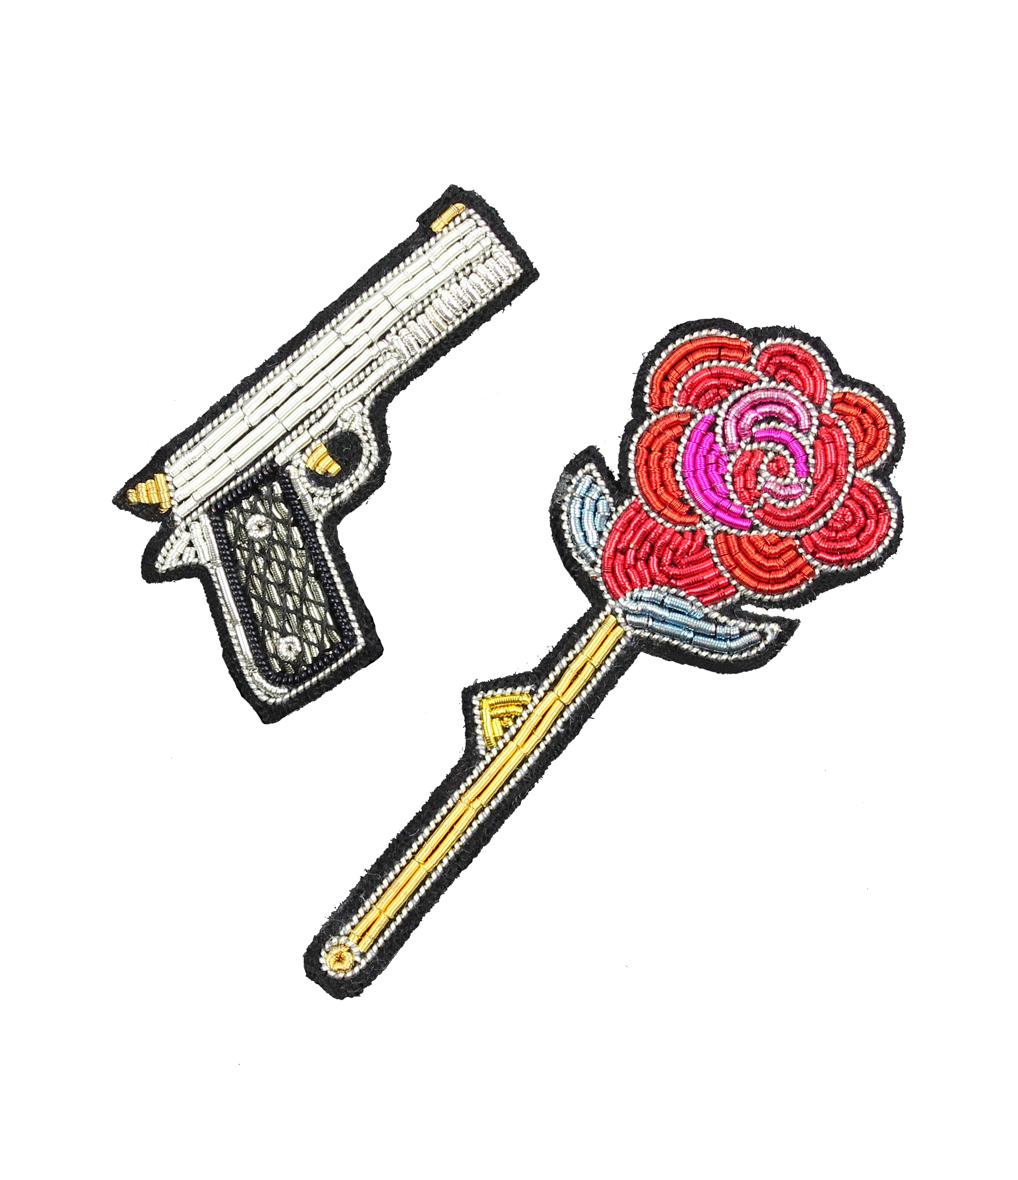 Lot de 2 Broches Brodées Main Gun & Rose